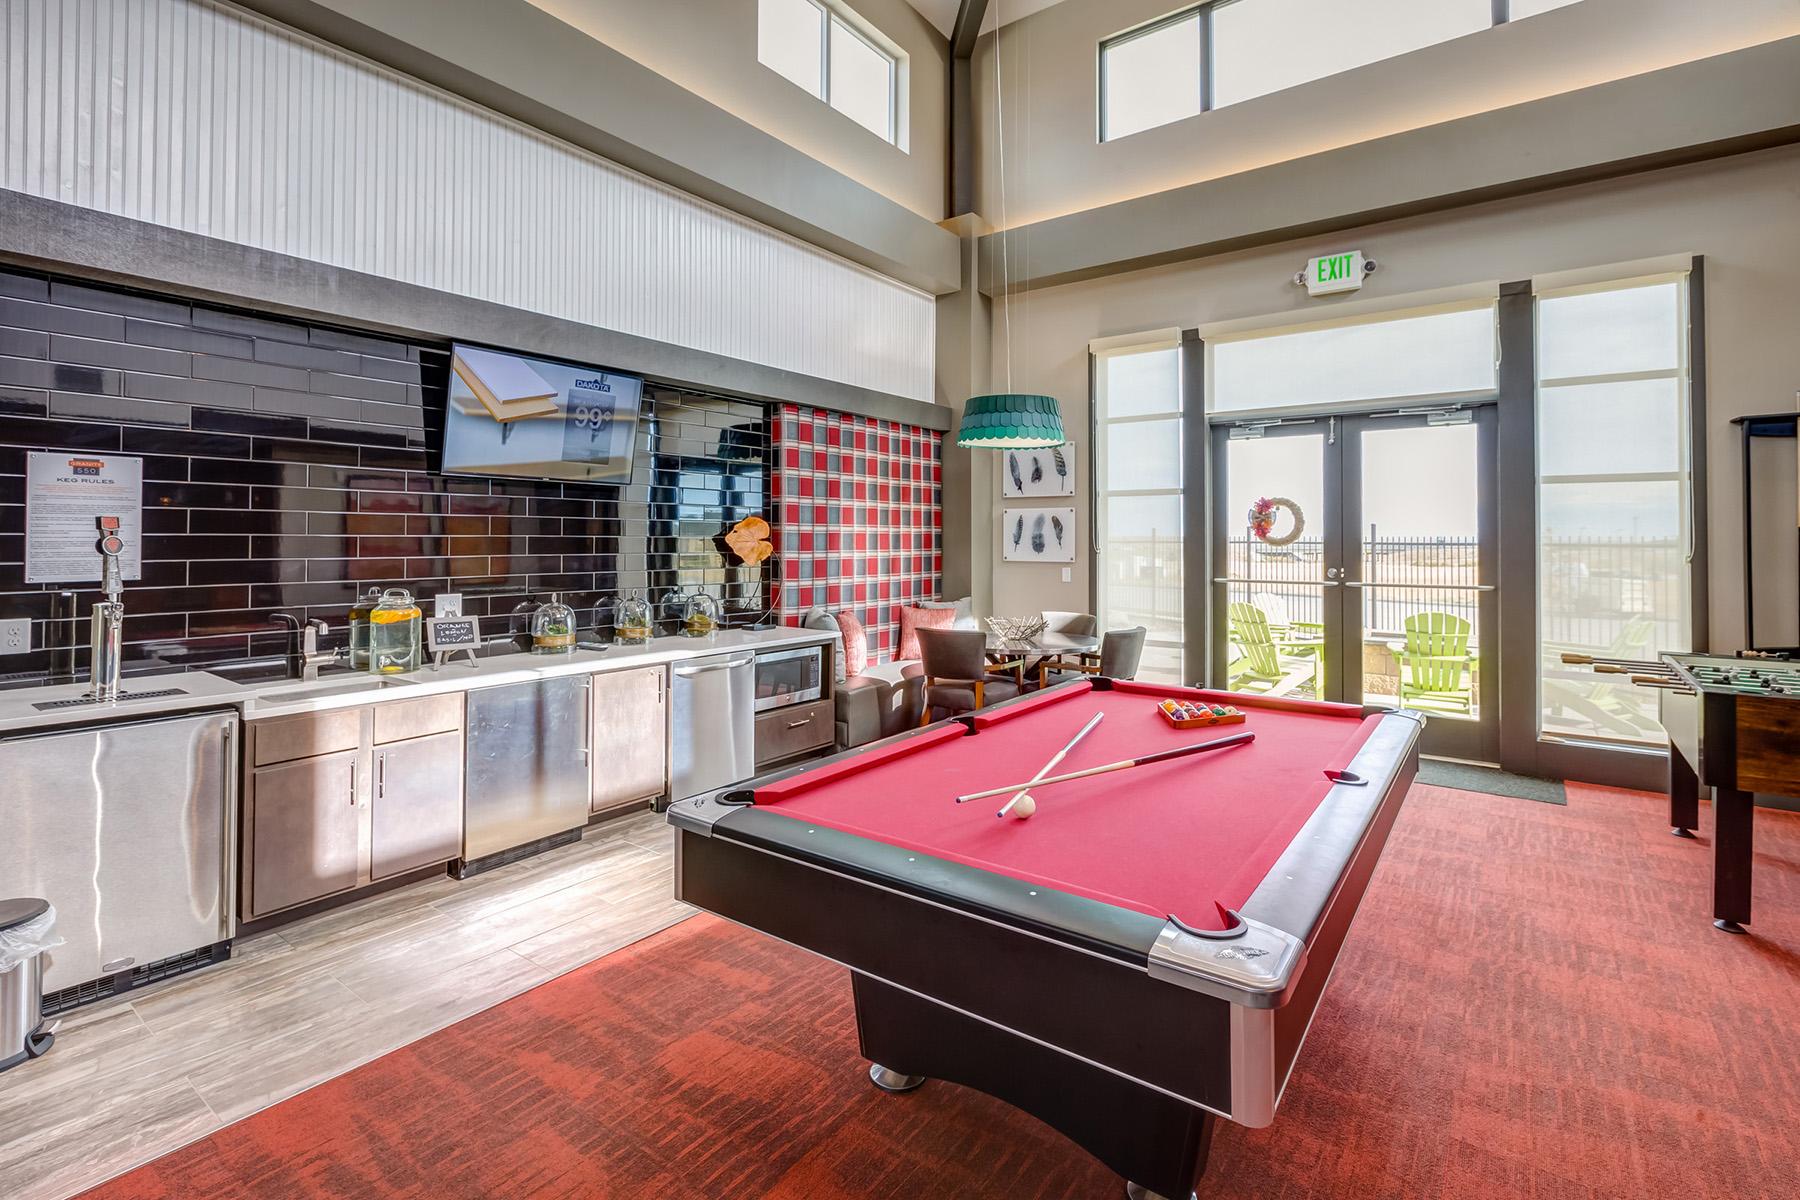 Apartments for rent in casper wy granite 550 home - 3 bedroom house rentals casper wy ...